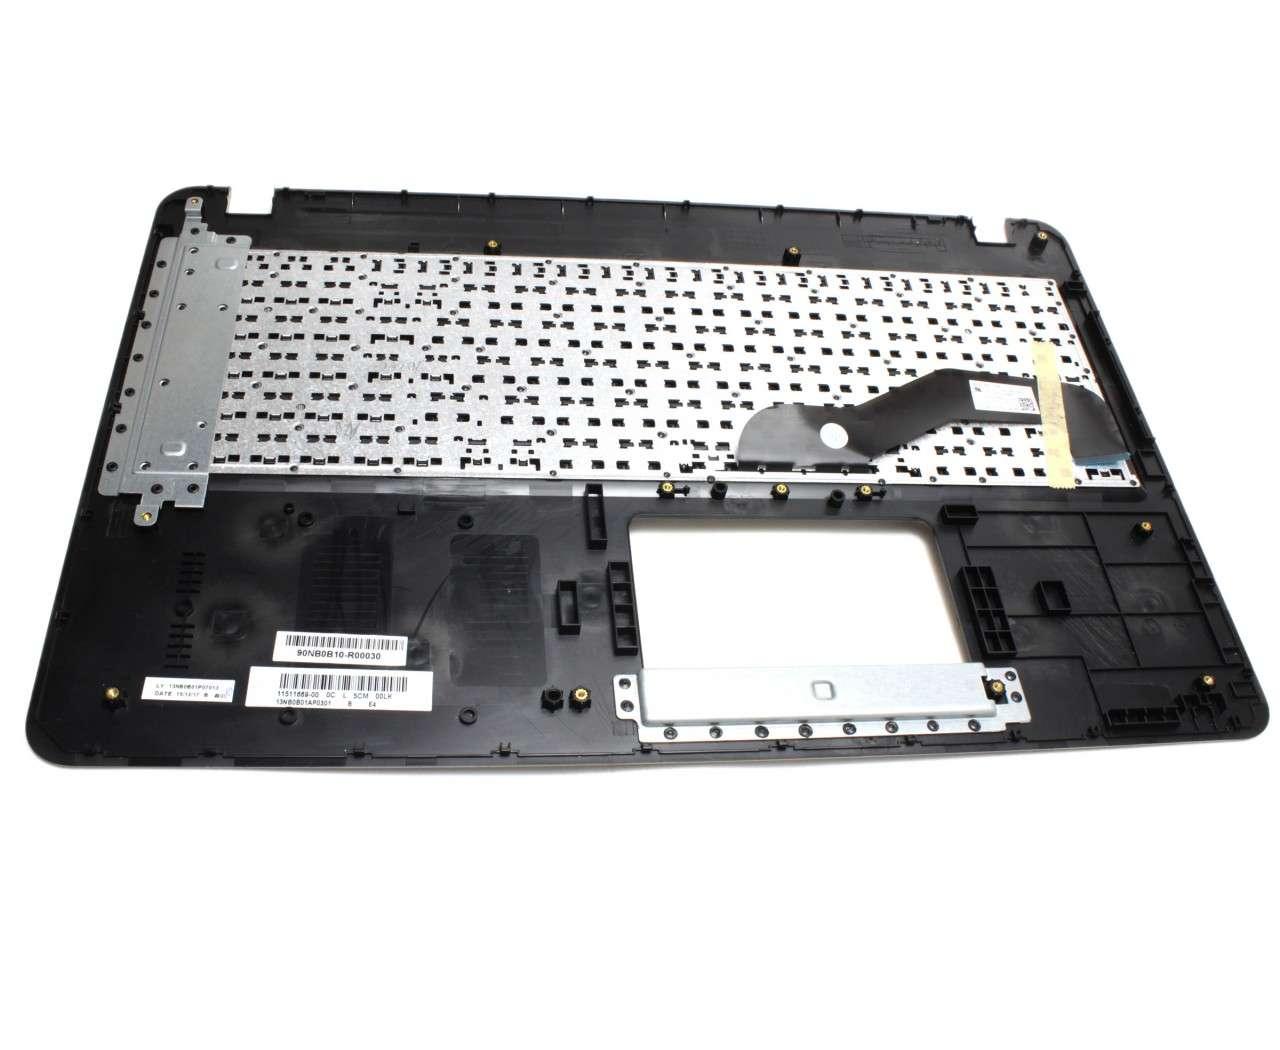 Tastatura Asus F540LJ neagra cu Palmrest auriu imagine powerlaptop.ro 2021